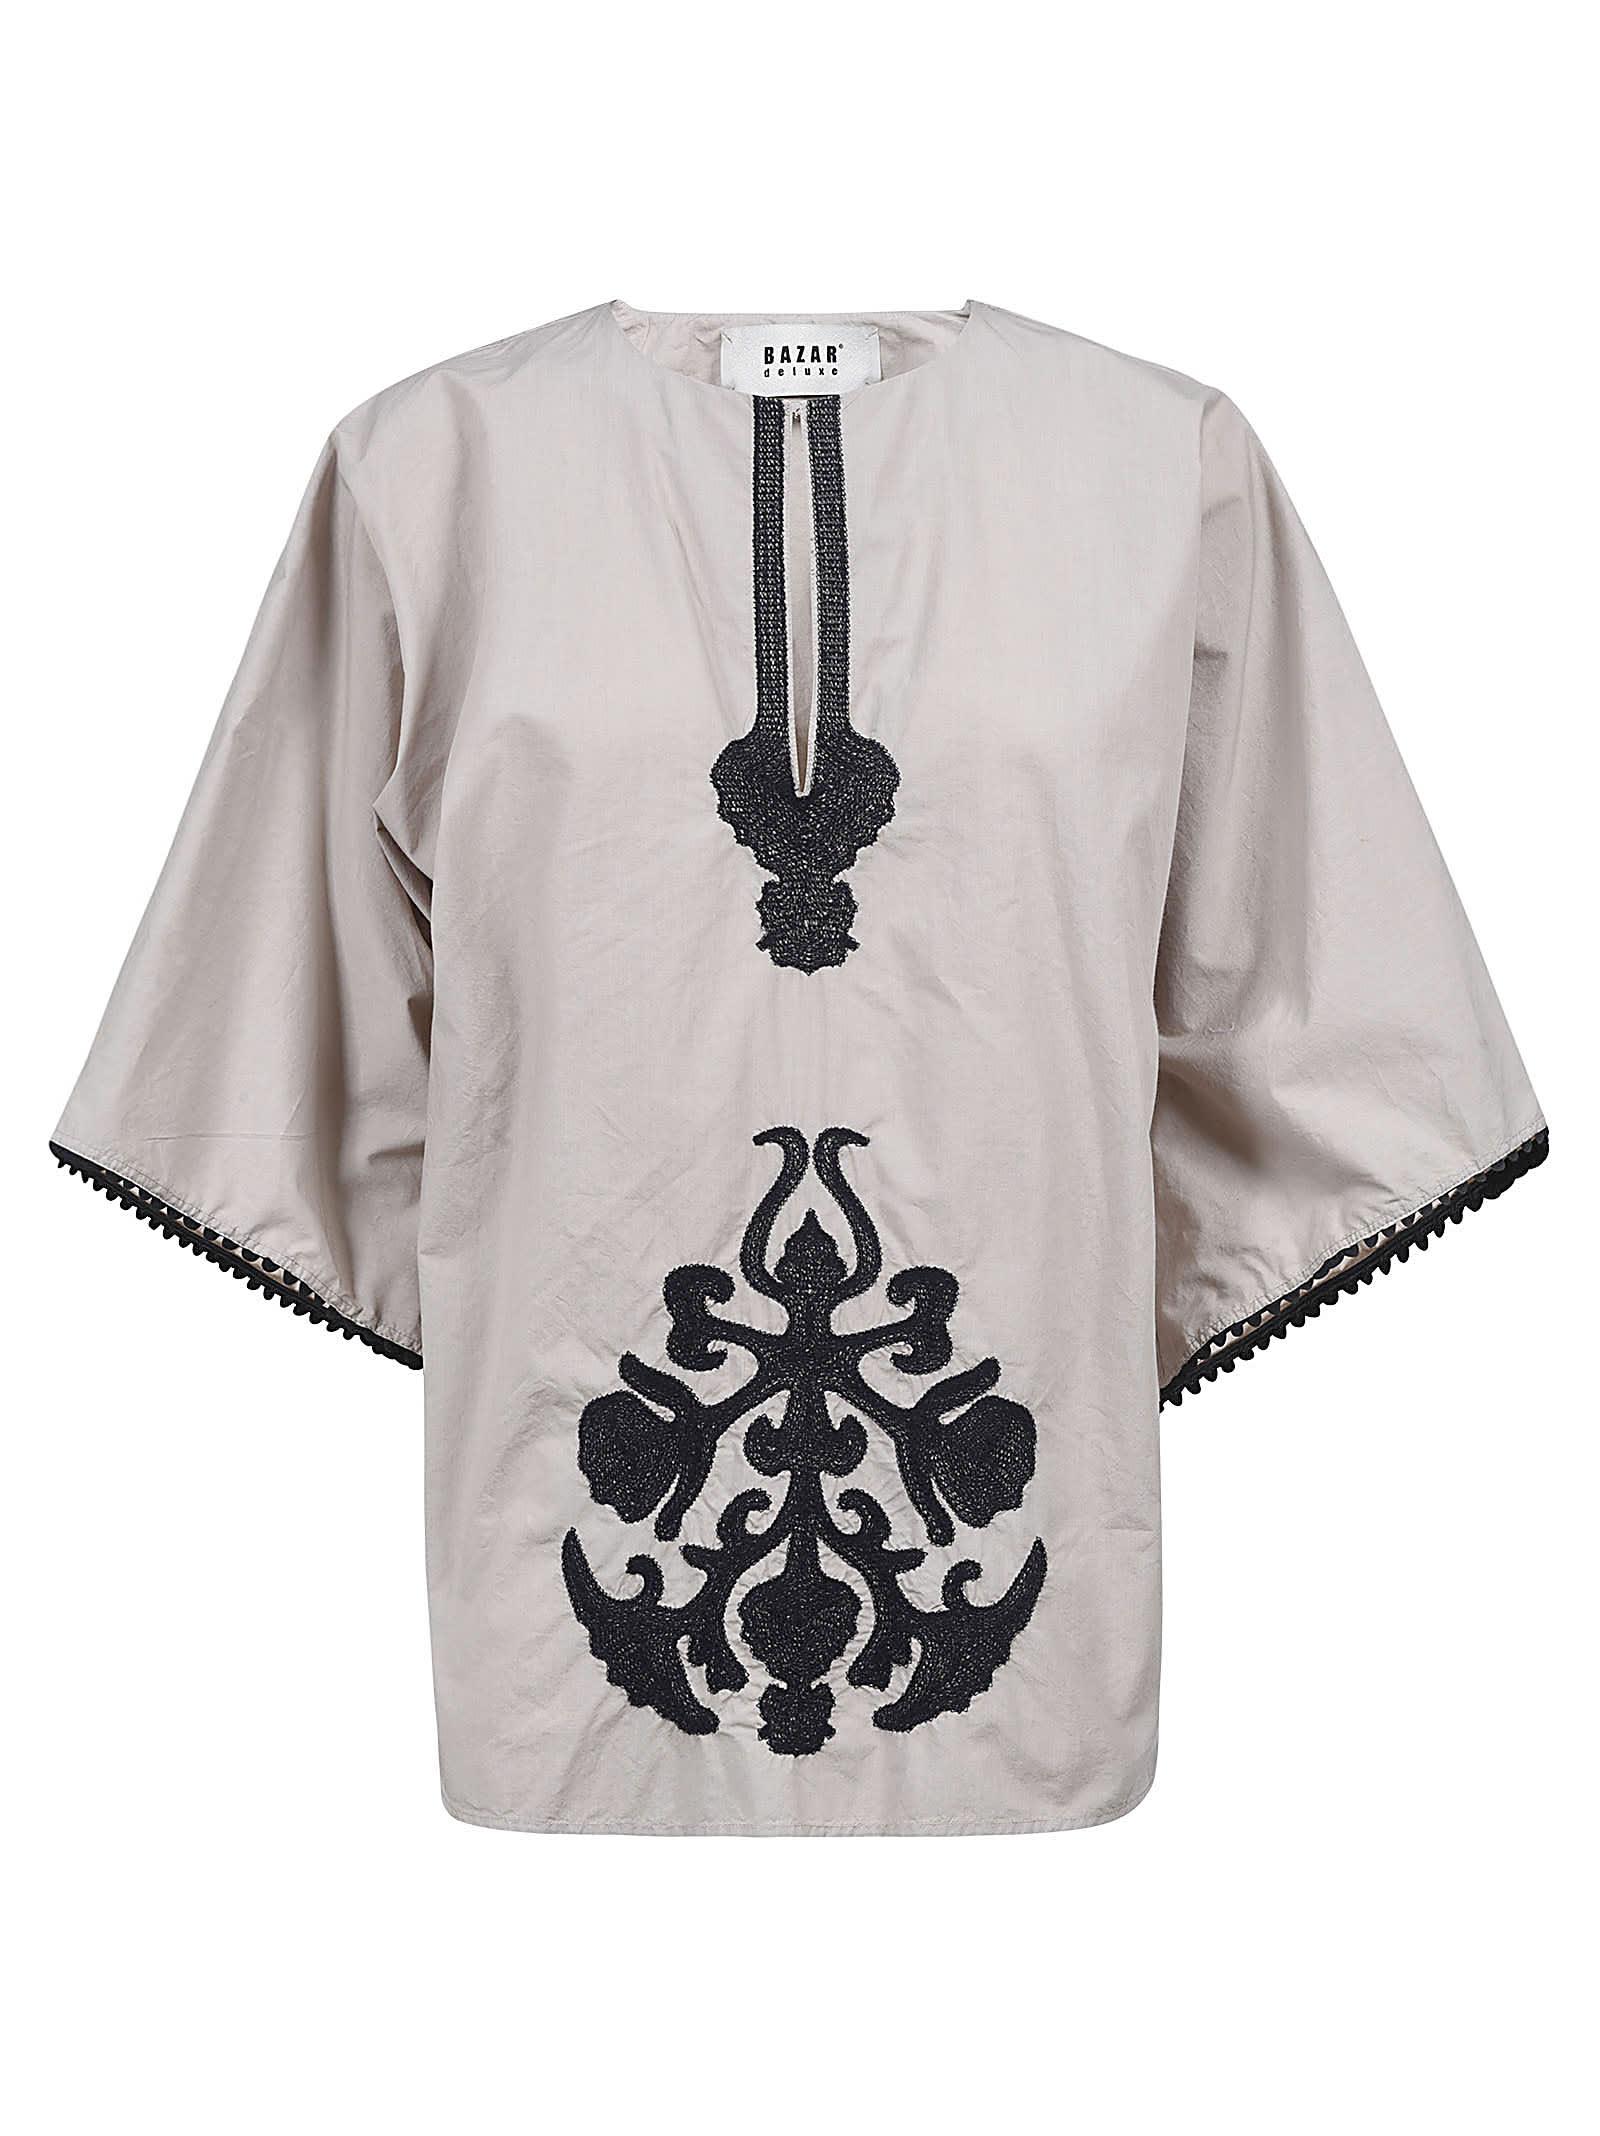 Bazar Deluxe Pattern Embellished Top In Beige